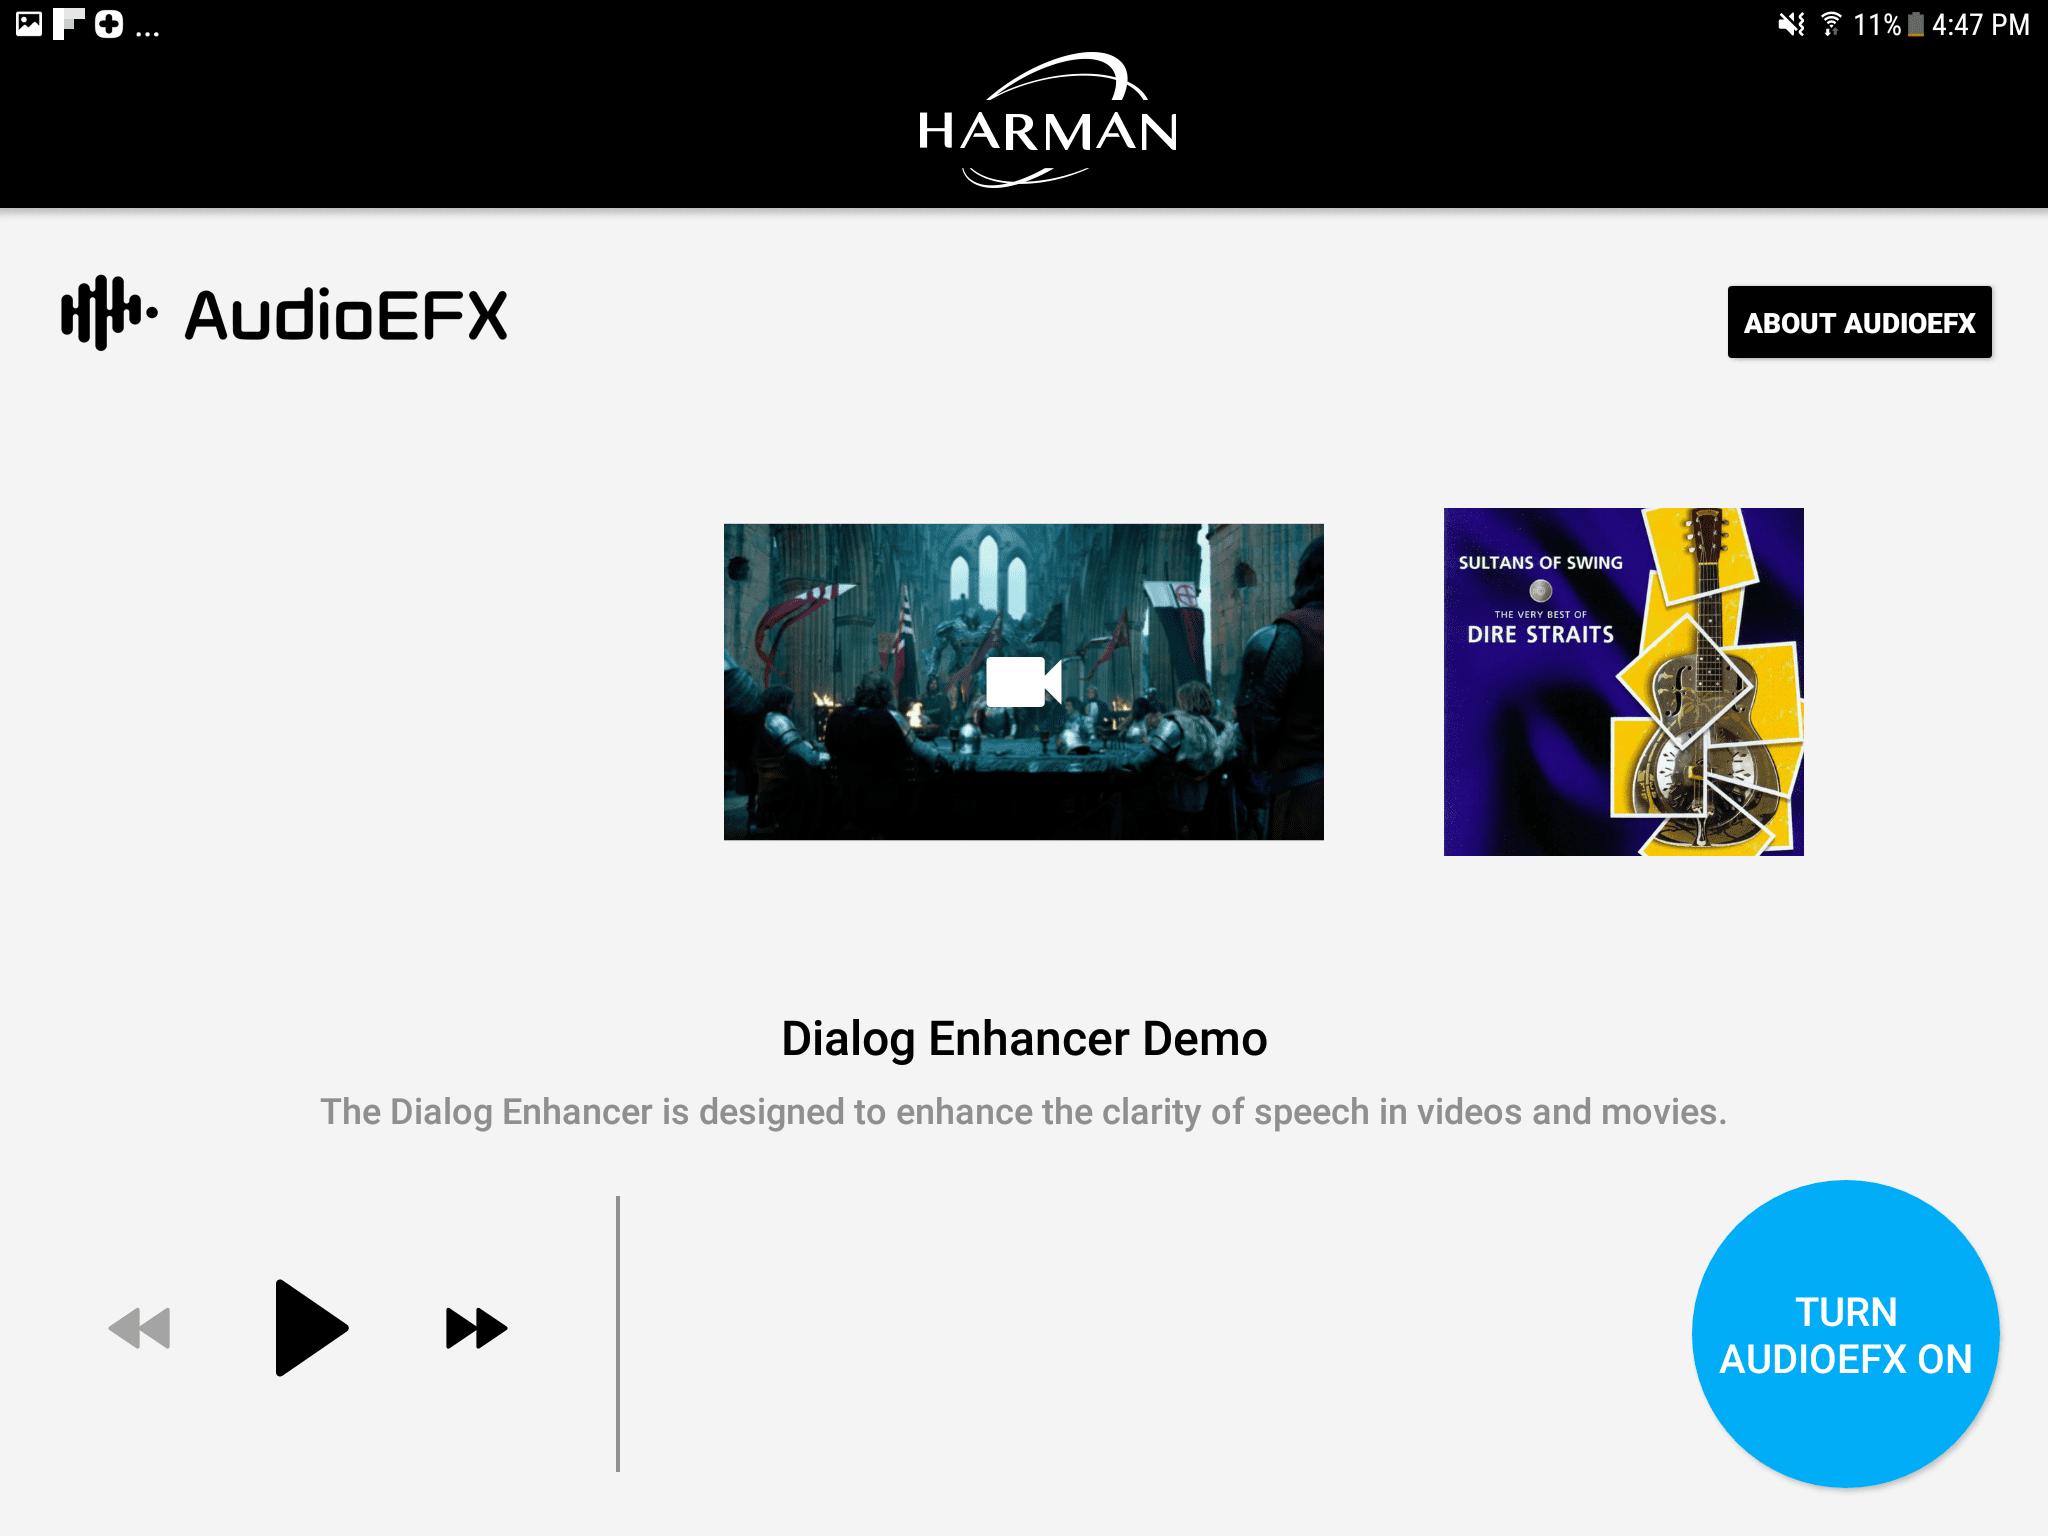 Harman app screenshot